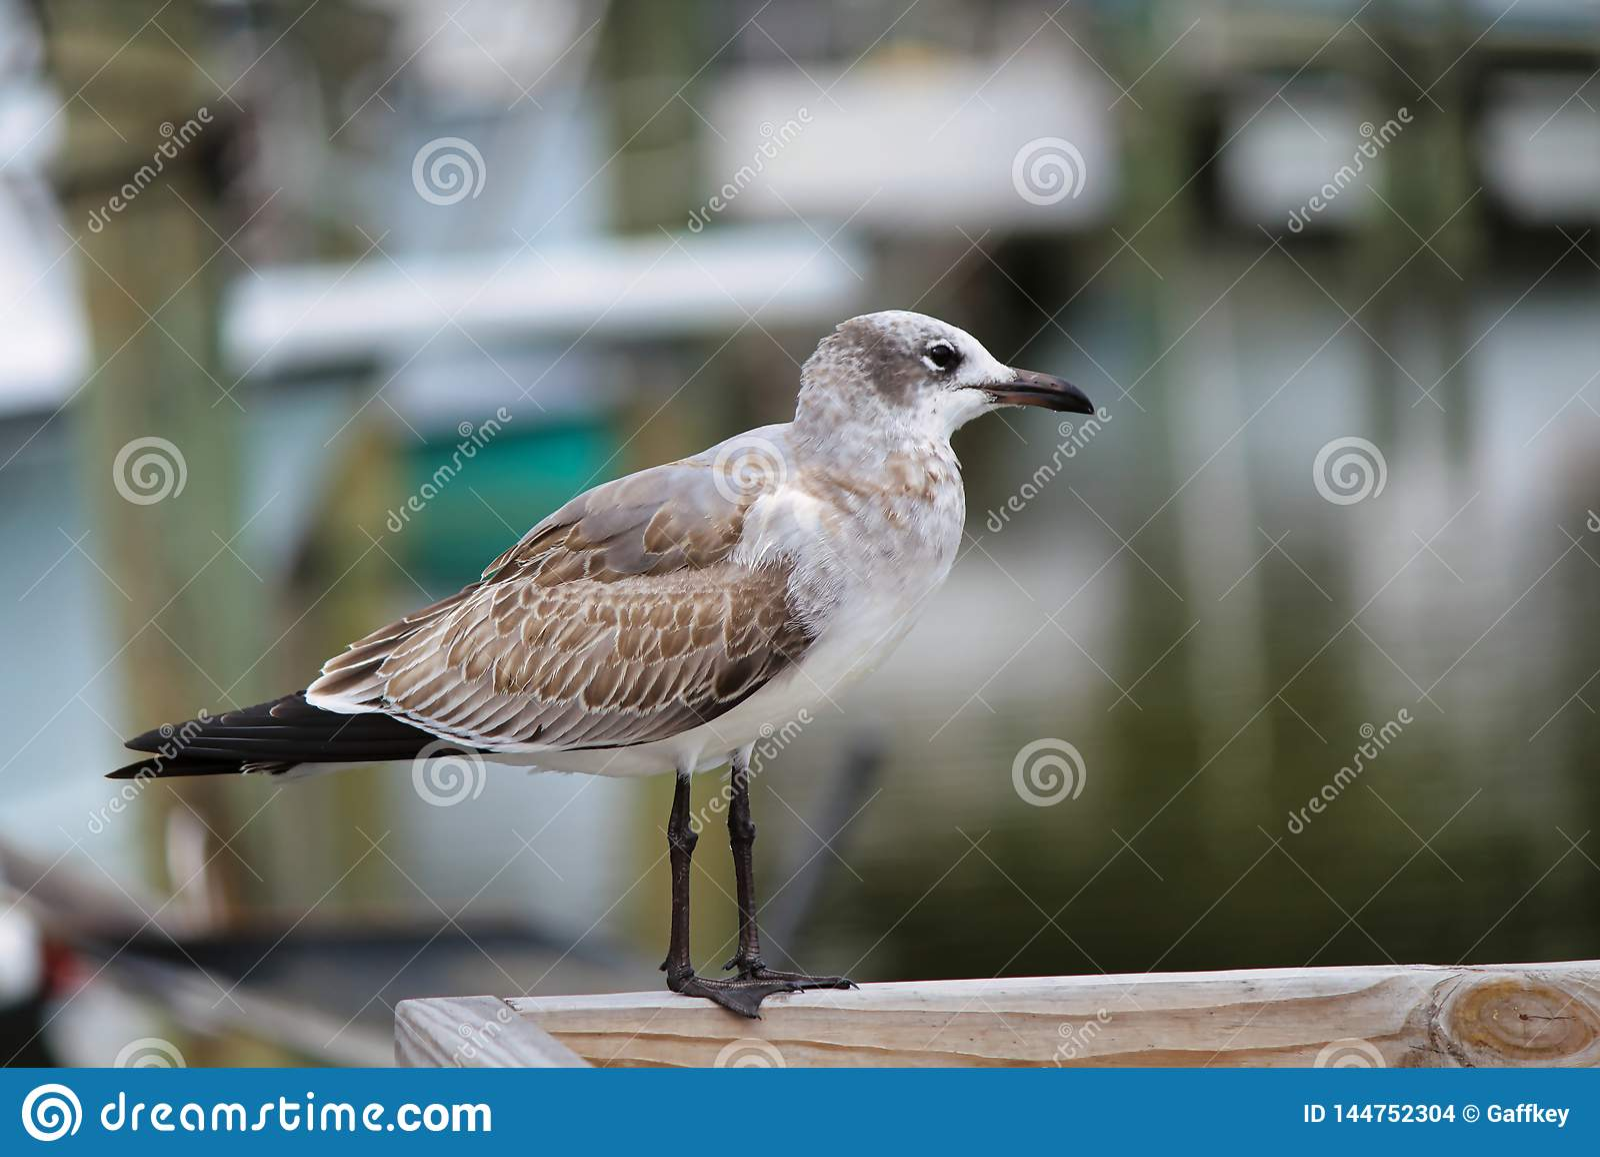 A soliary bird walking along a pier pecking the dock